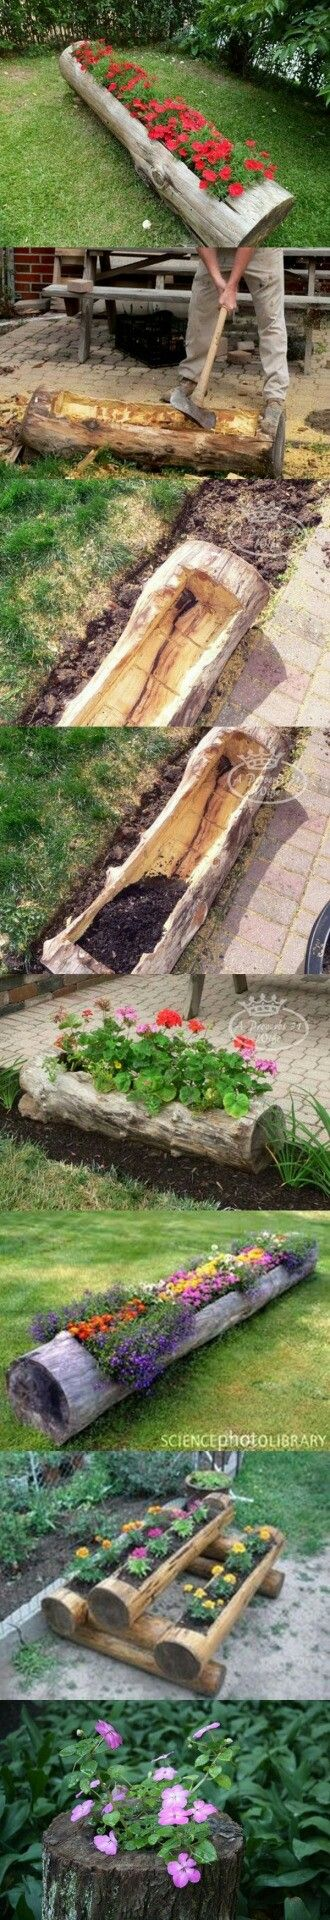 Boomstronk als plantenbak